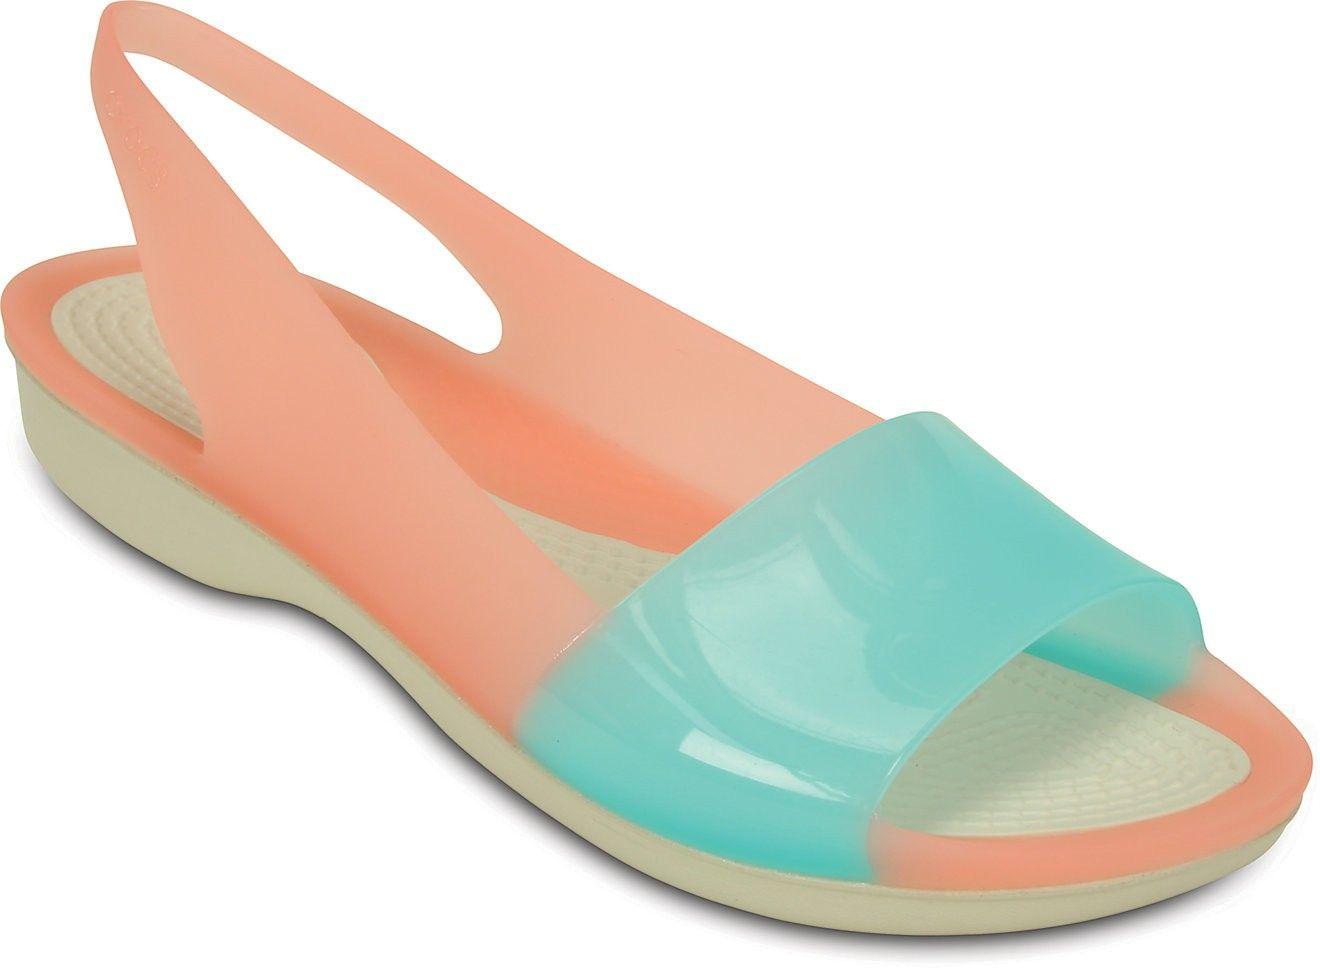 0132c726c88cf Crocs Women Black Flats - Buy Melon, Pool Color Crocs Women Black Flats  Online at Best Price - Shop Online for Footwears in India |…